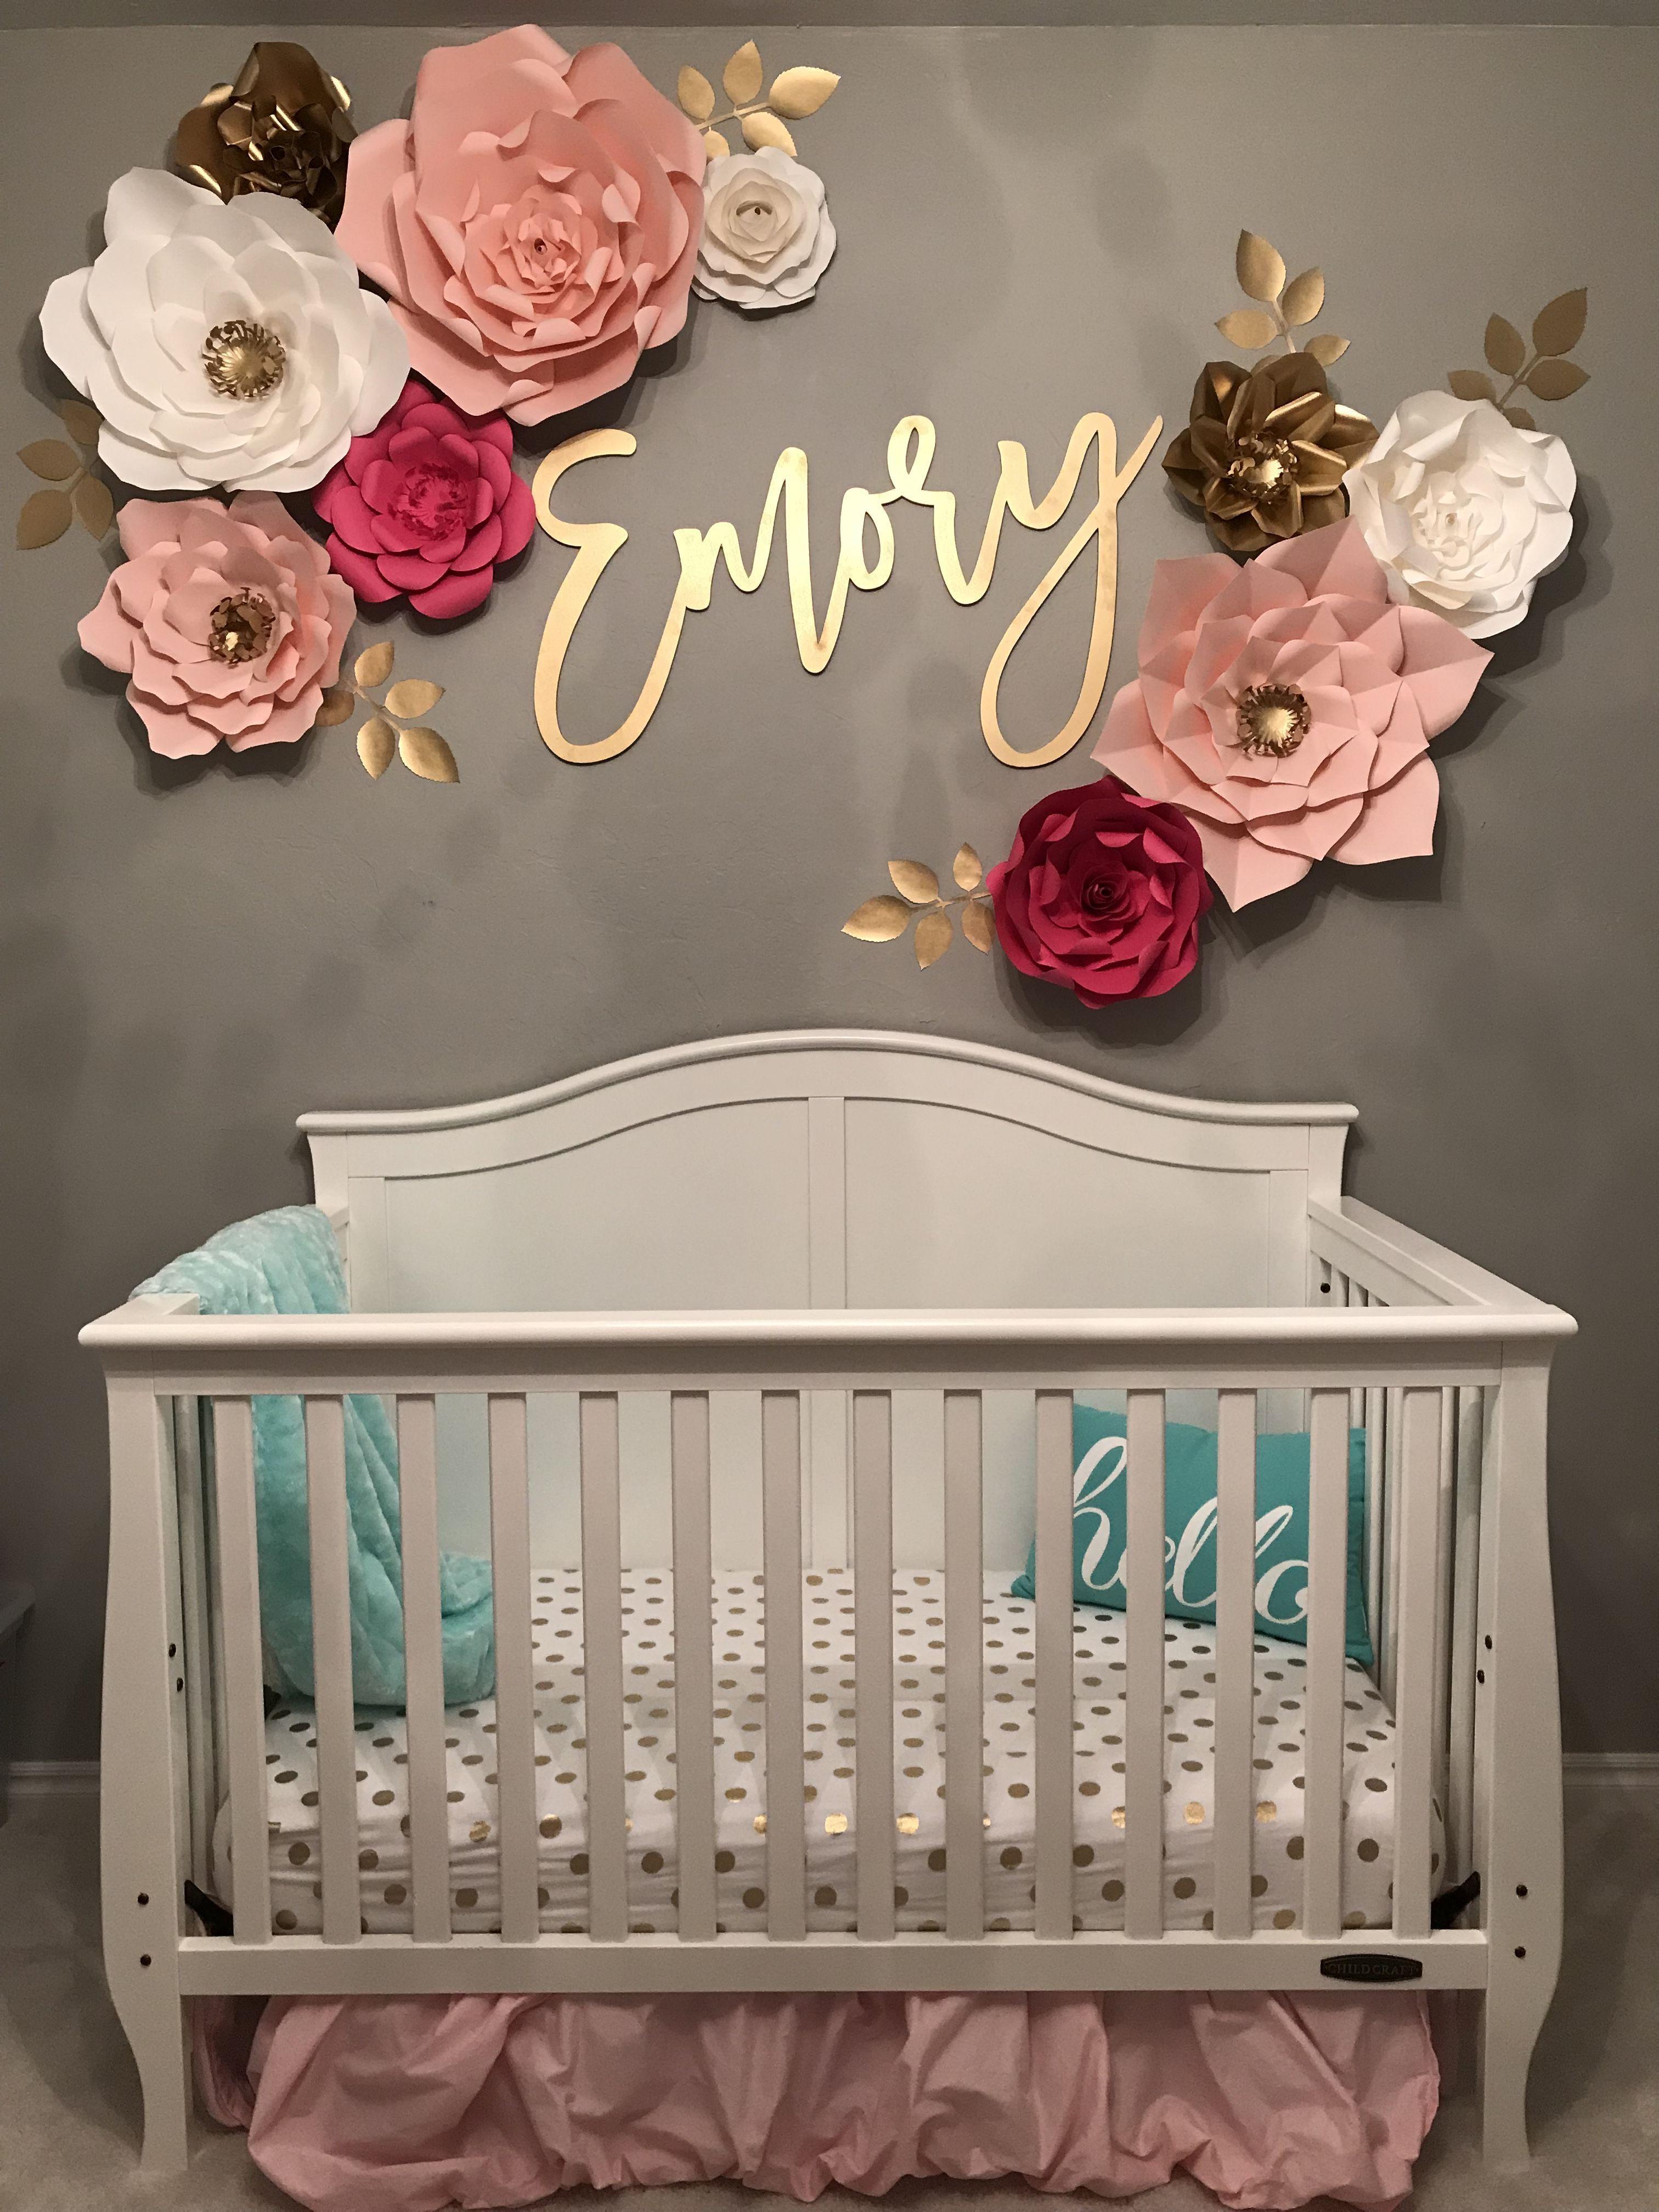 20 latest trend of cute baby girl room ideas decorideas nursery rh co pinterest com cute baby ideas for room cute baby ideas costume